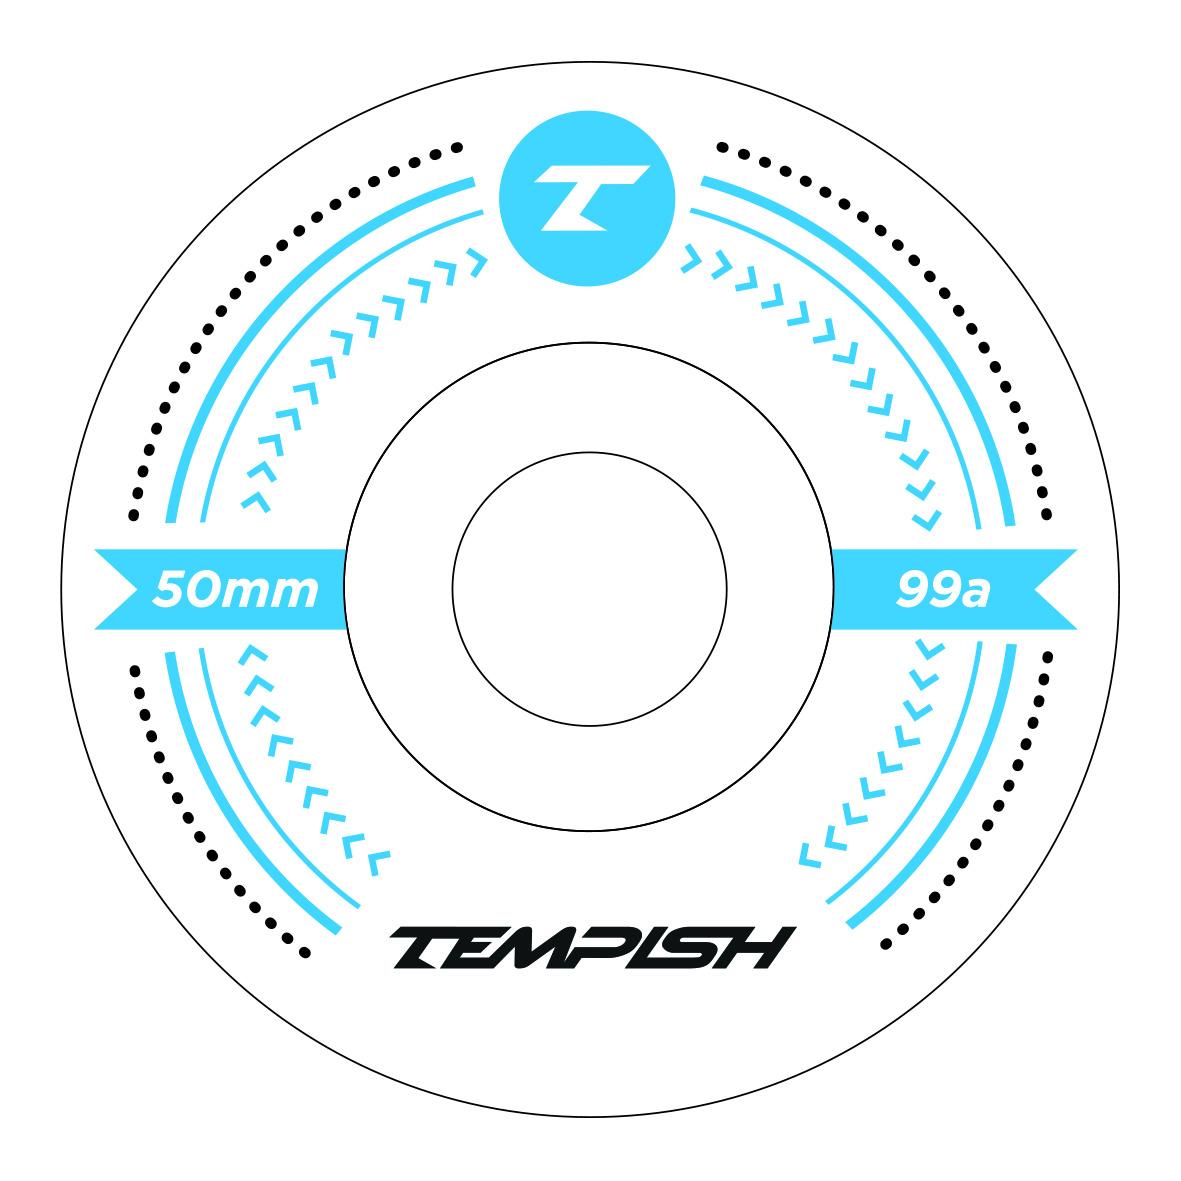 Колеса (4 Штуки) Для Скейтборда Tempish 2018 Lb 50X36 99A Blue